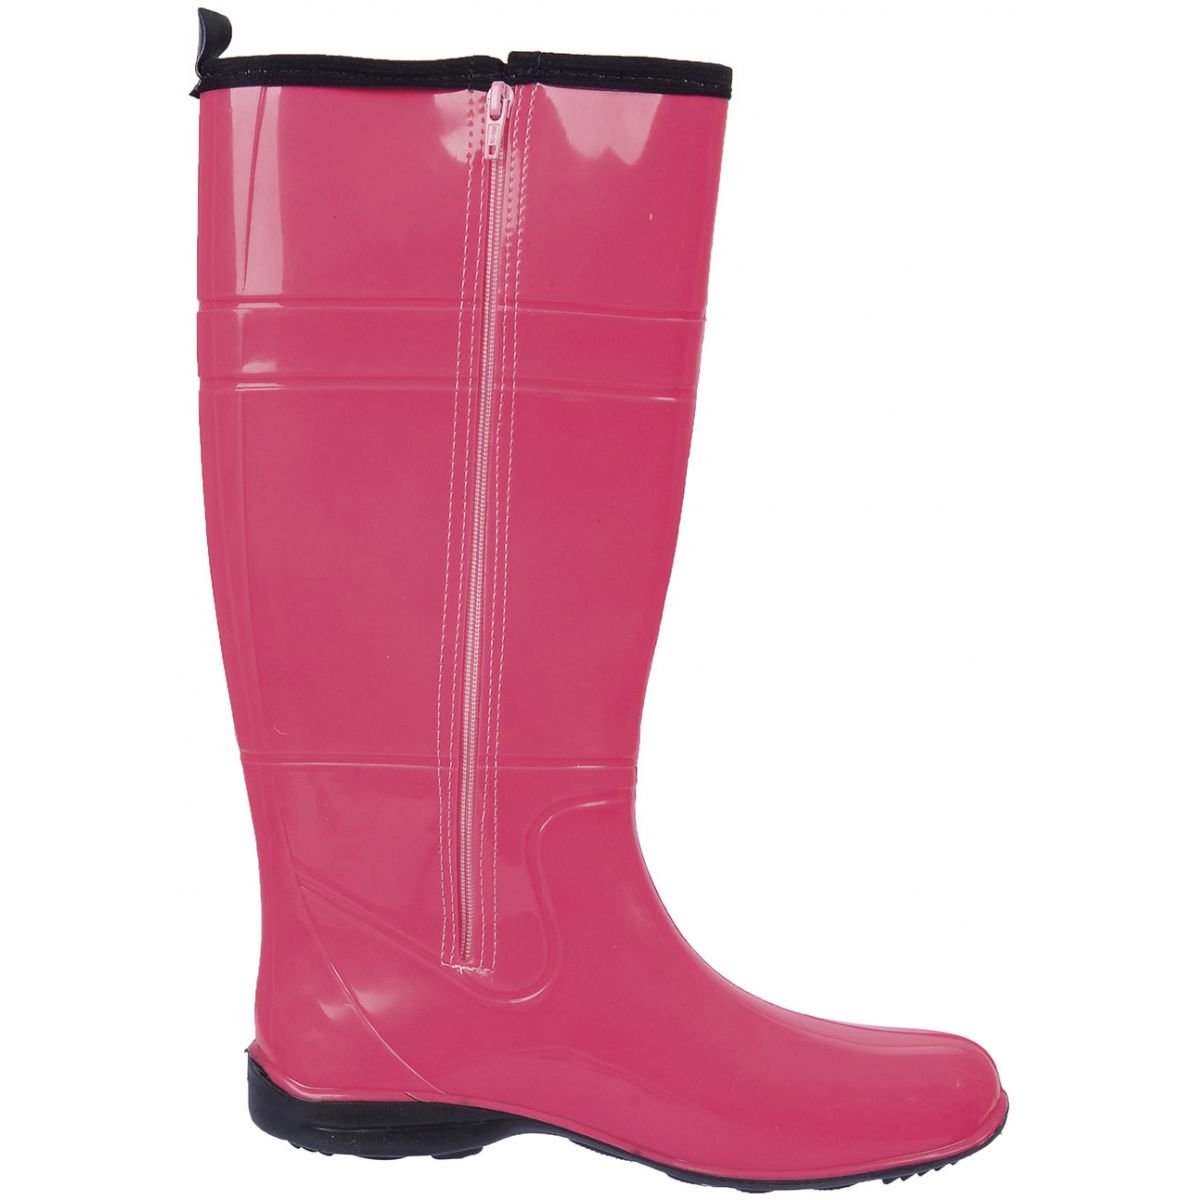 Galocha Alpat Fashion Pink Com Zíper  - Casafaz